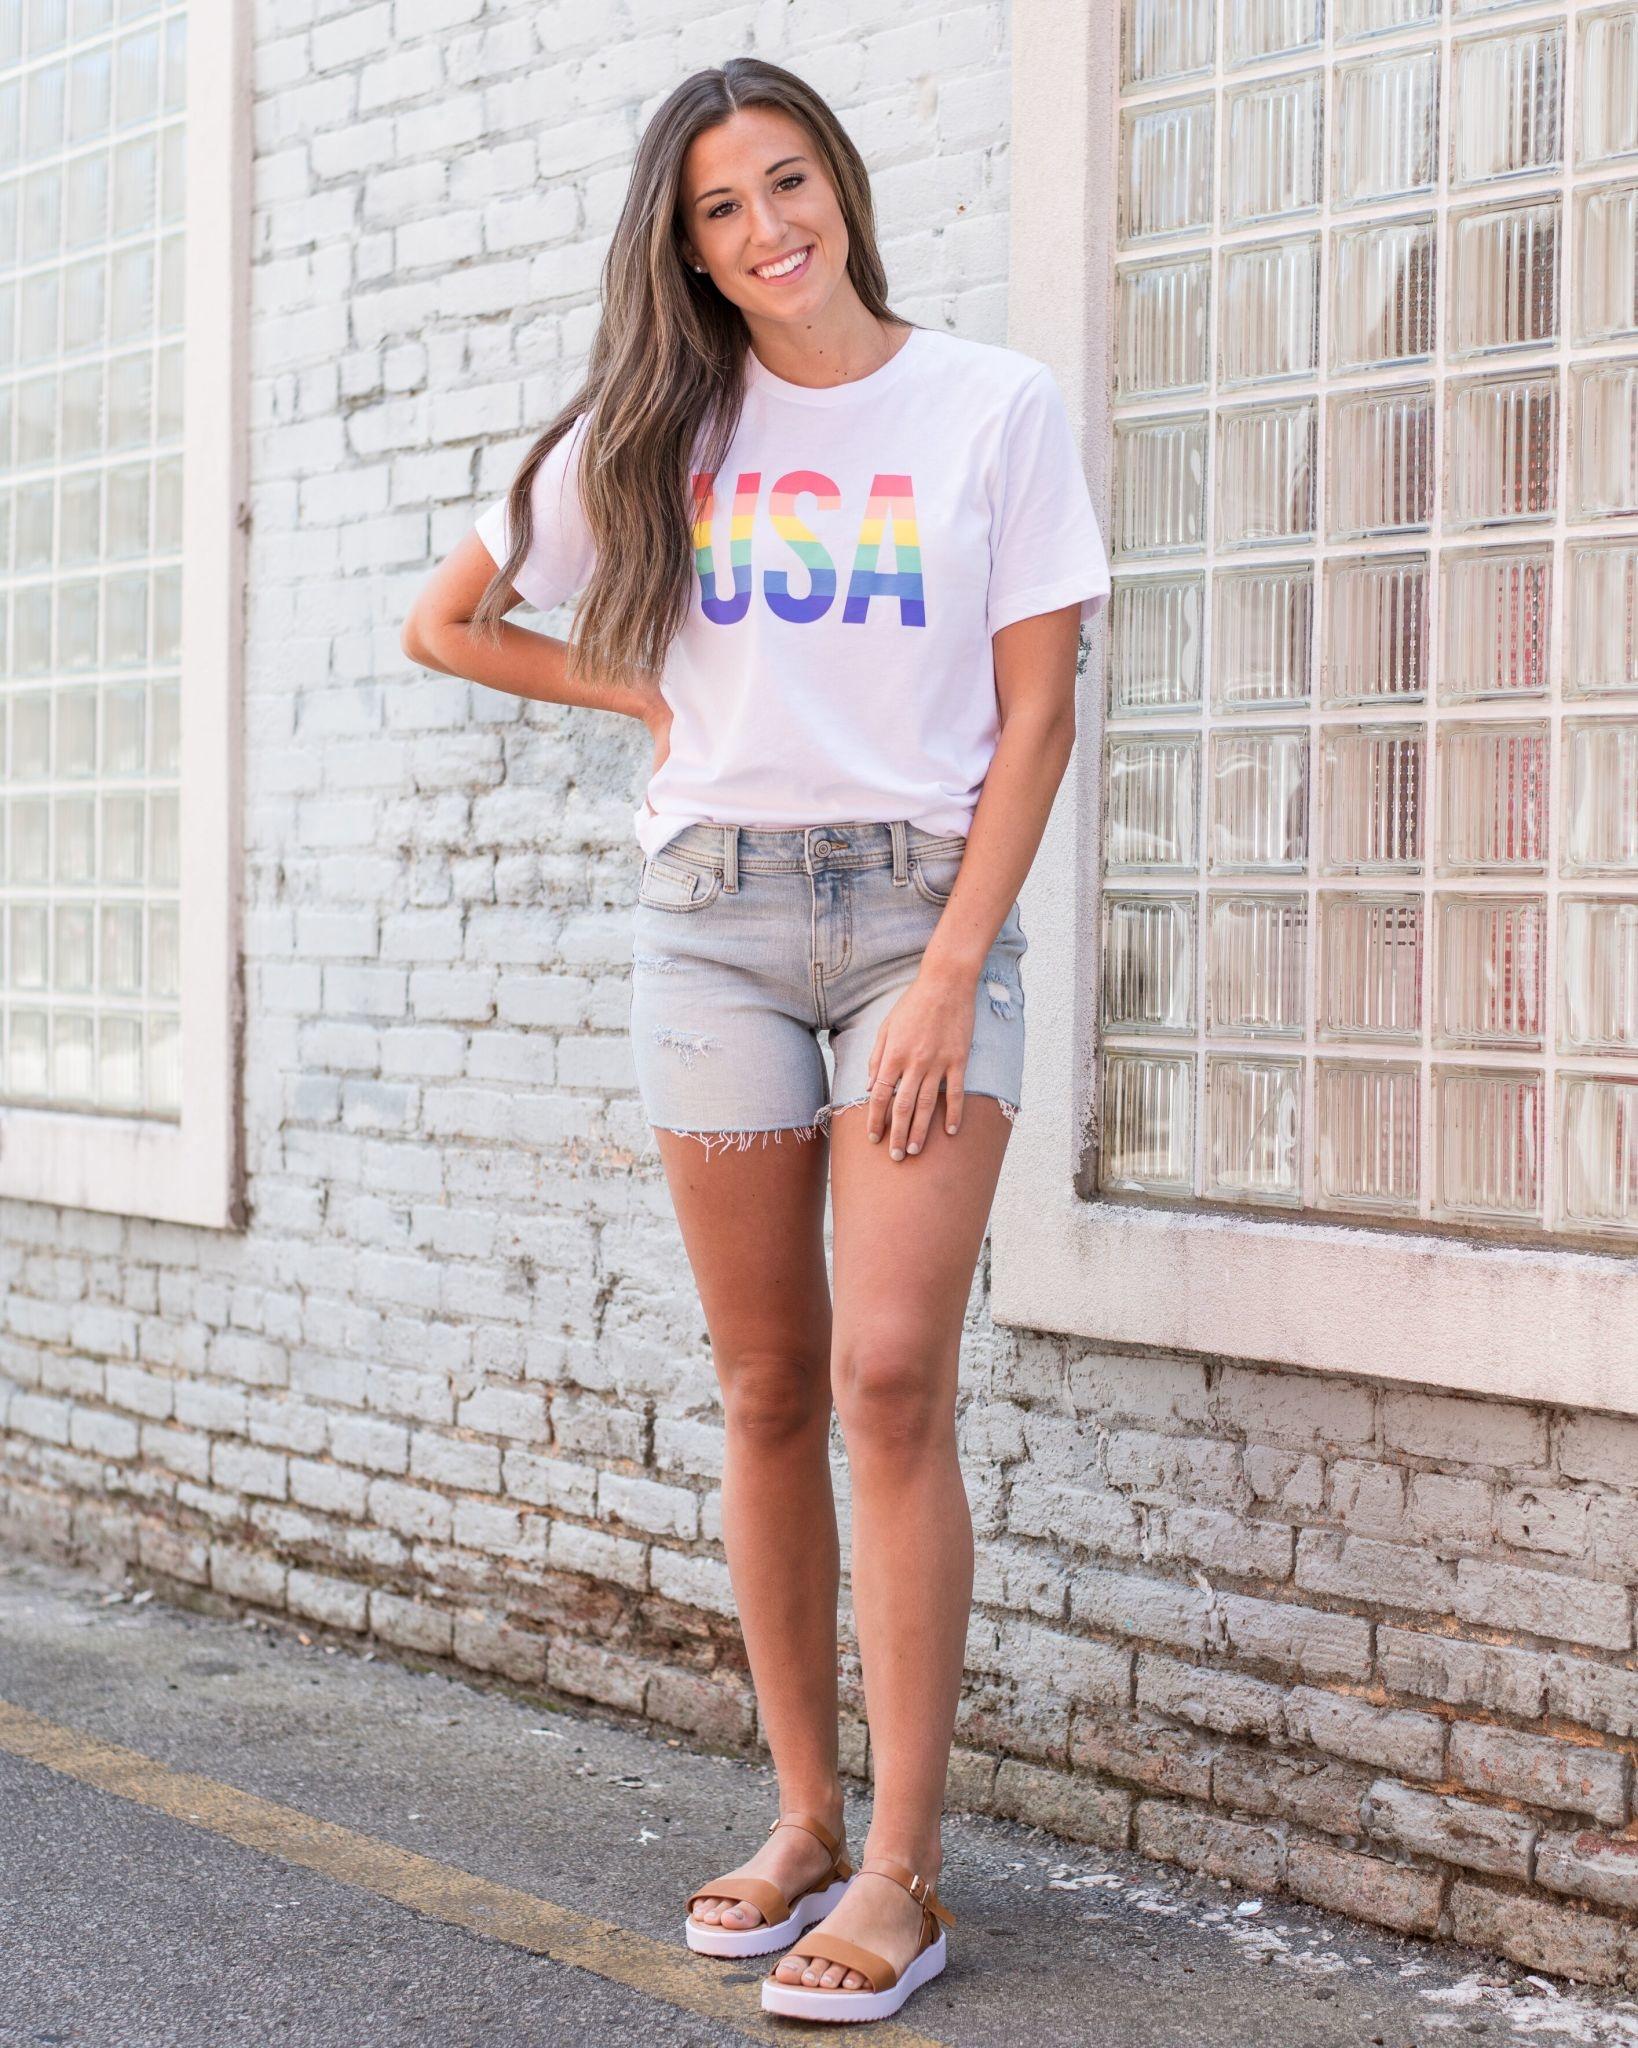 Rainbow USA tee